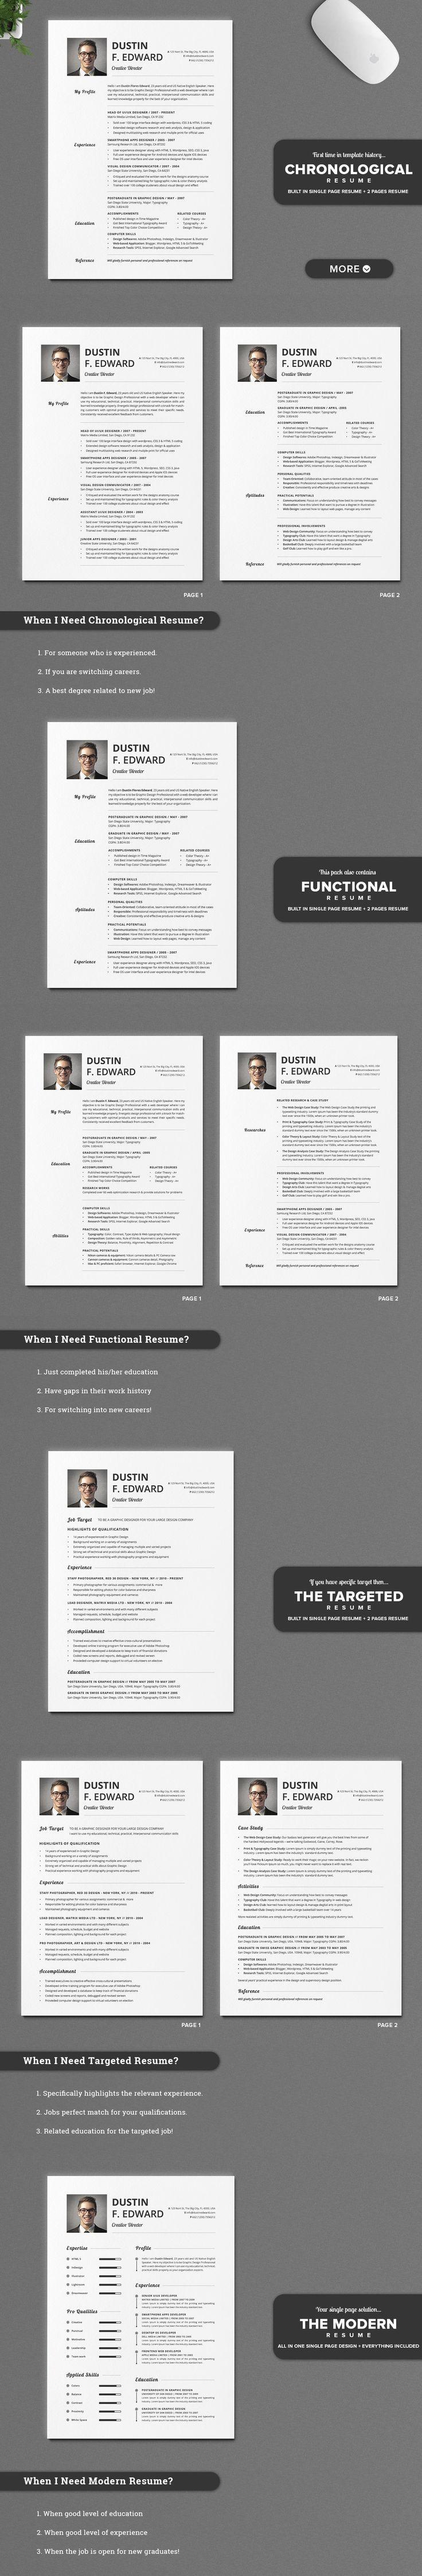 16 Best Resume Images On Pinterest Resume Templates